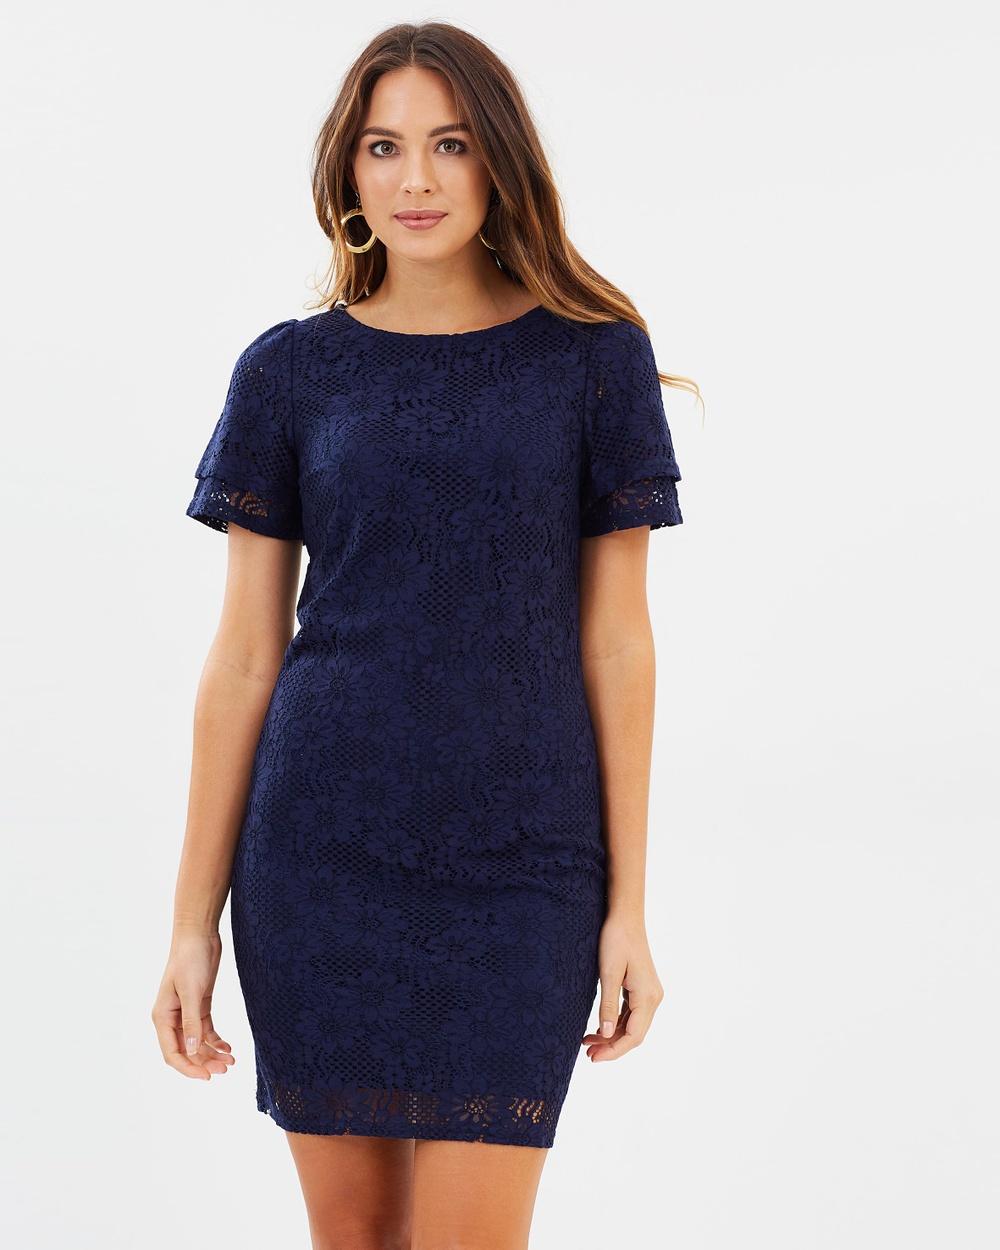 Dorothy Perkins Lace Shift Dress Dresses Navy Blue Lace Shift Dress